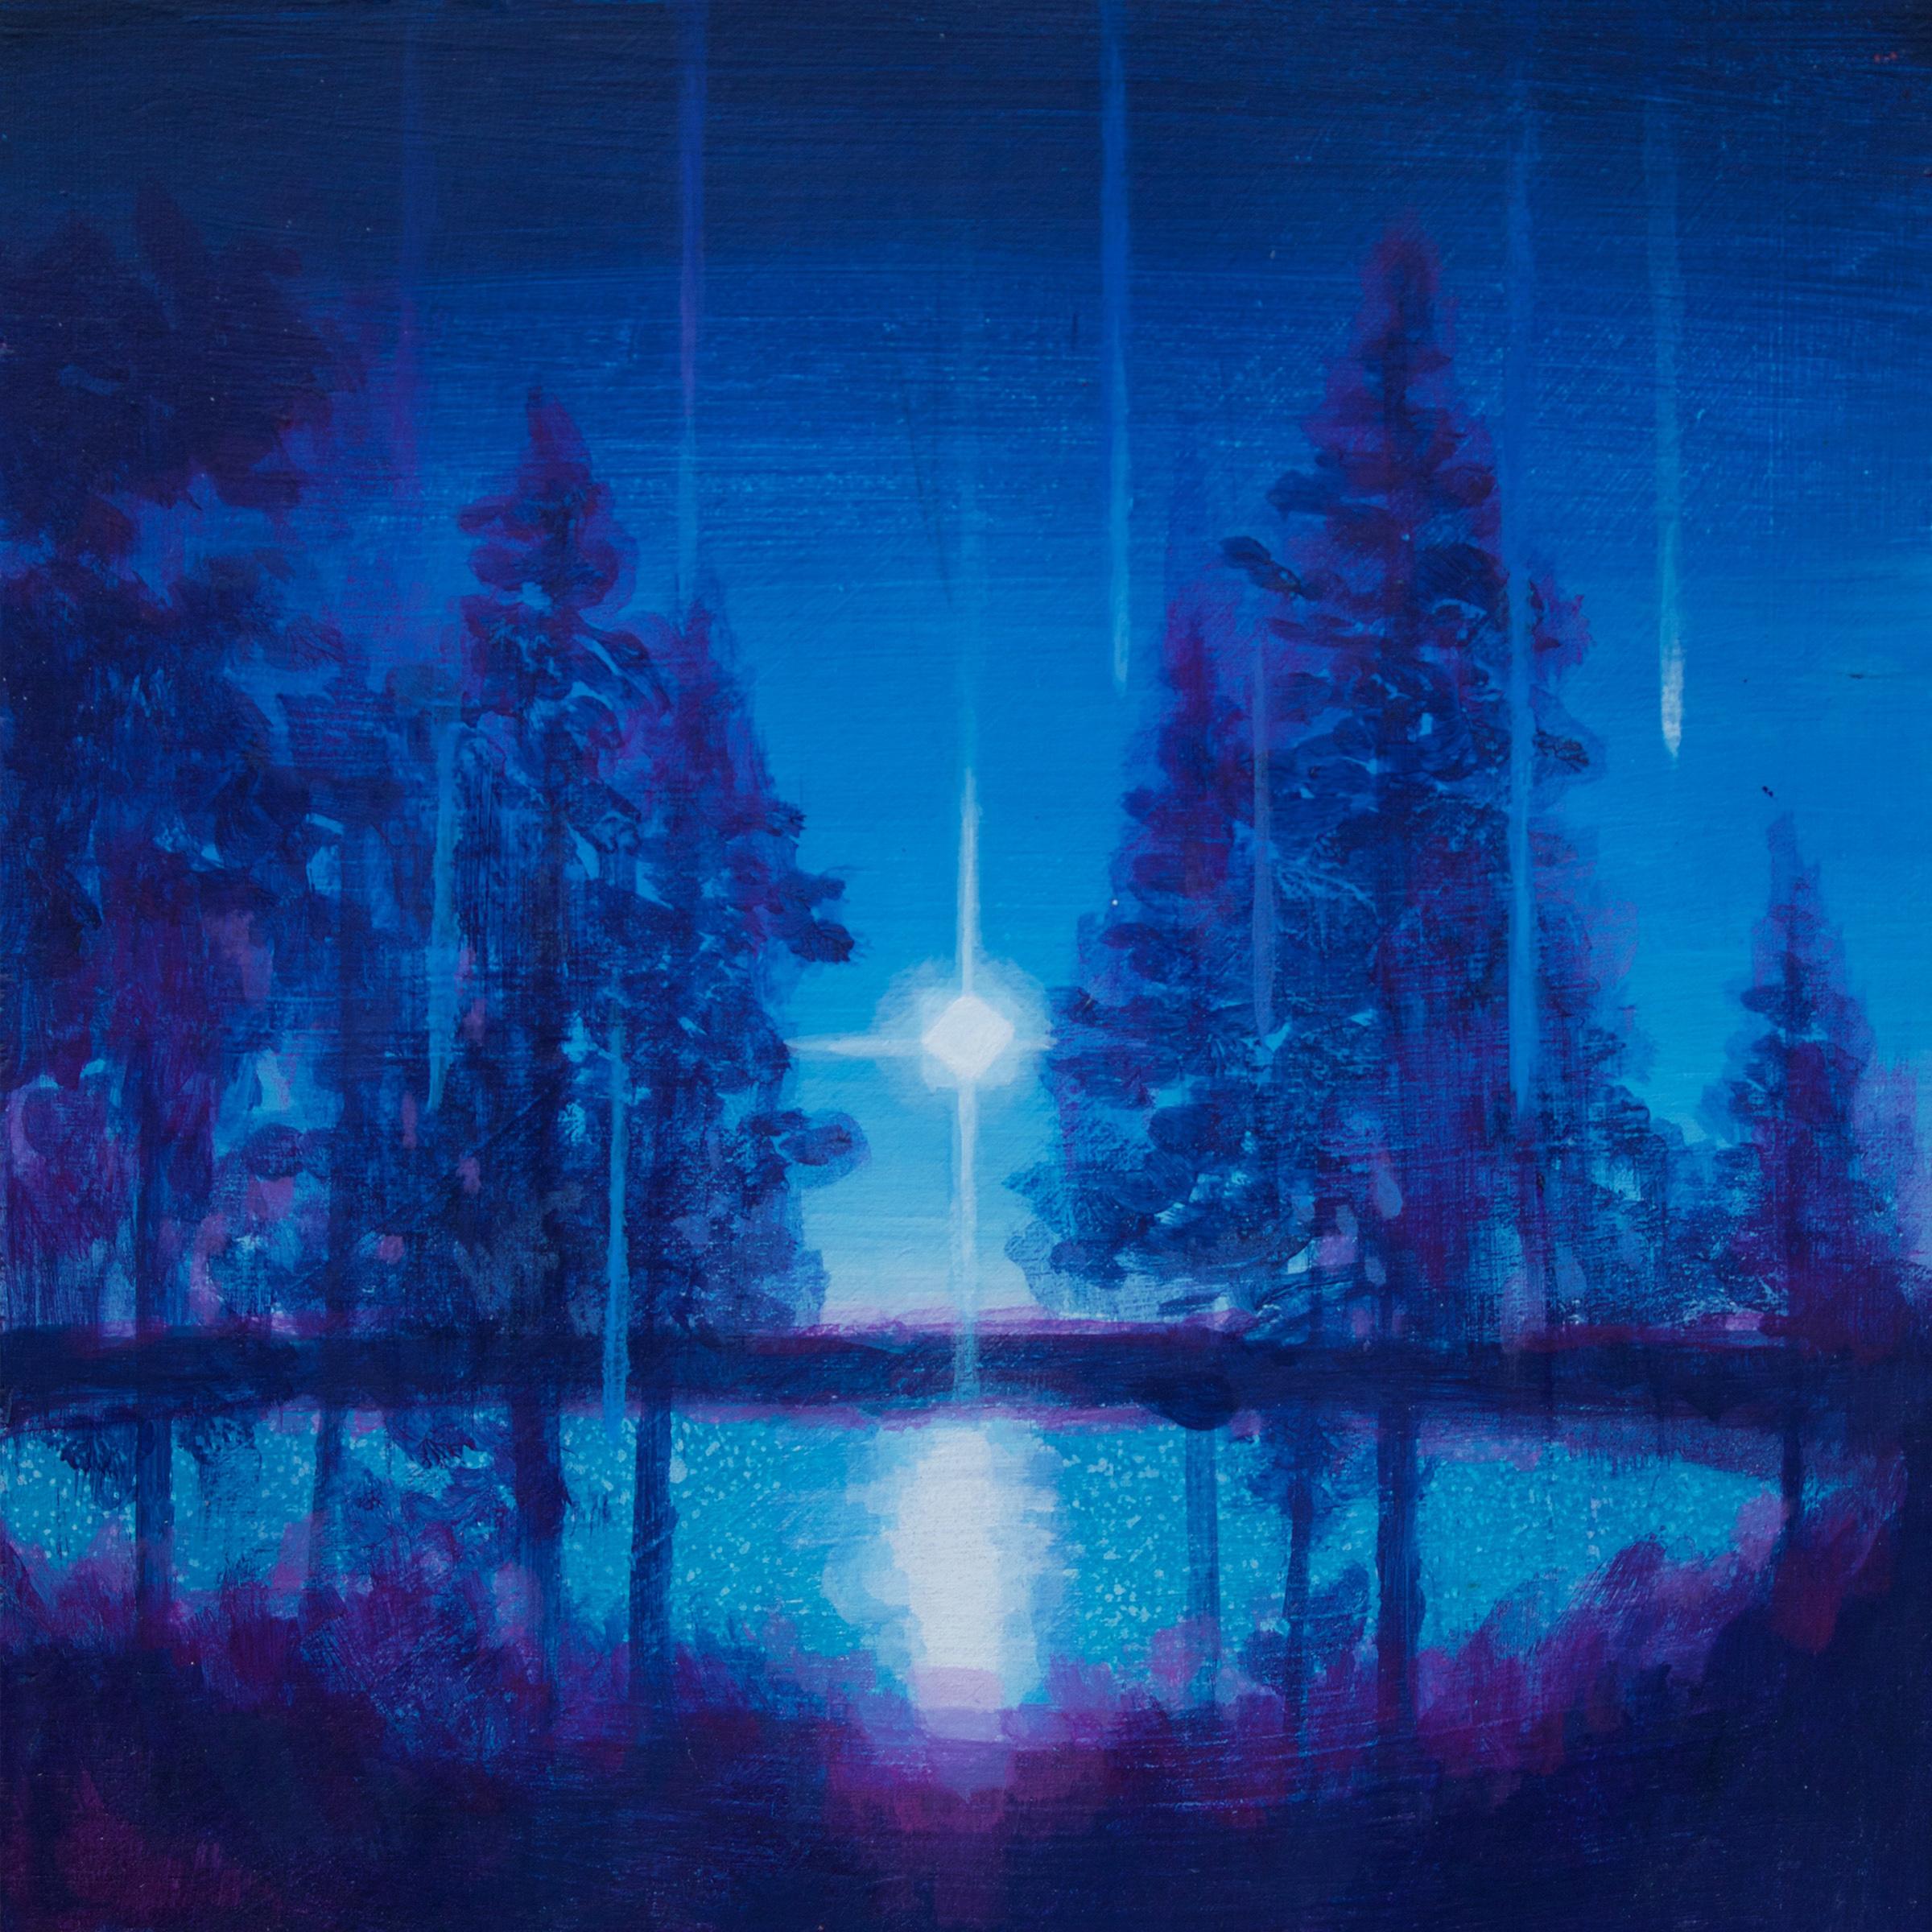 Eli McMullen Star Glare 6_x6_ acrylic 2018 NFS.jpg